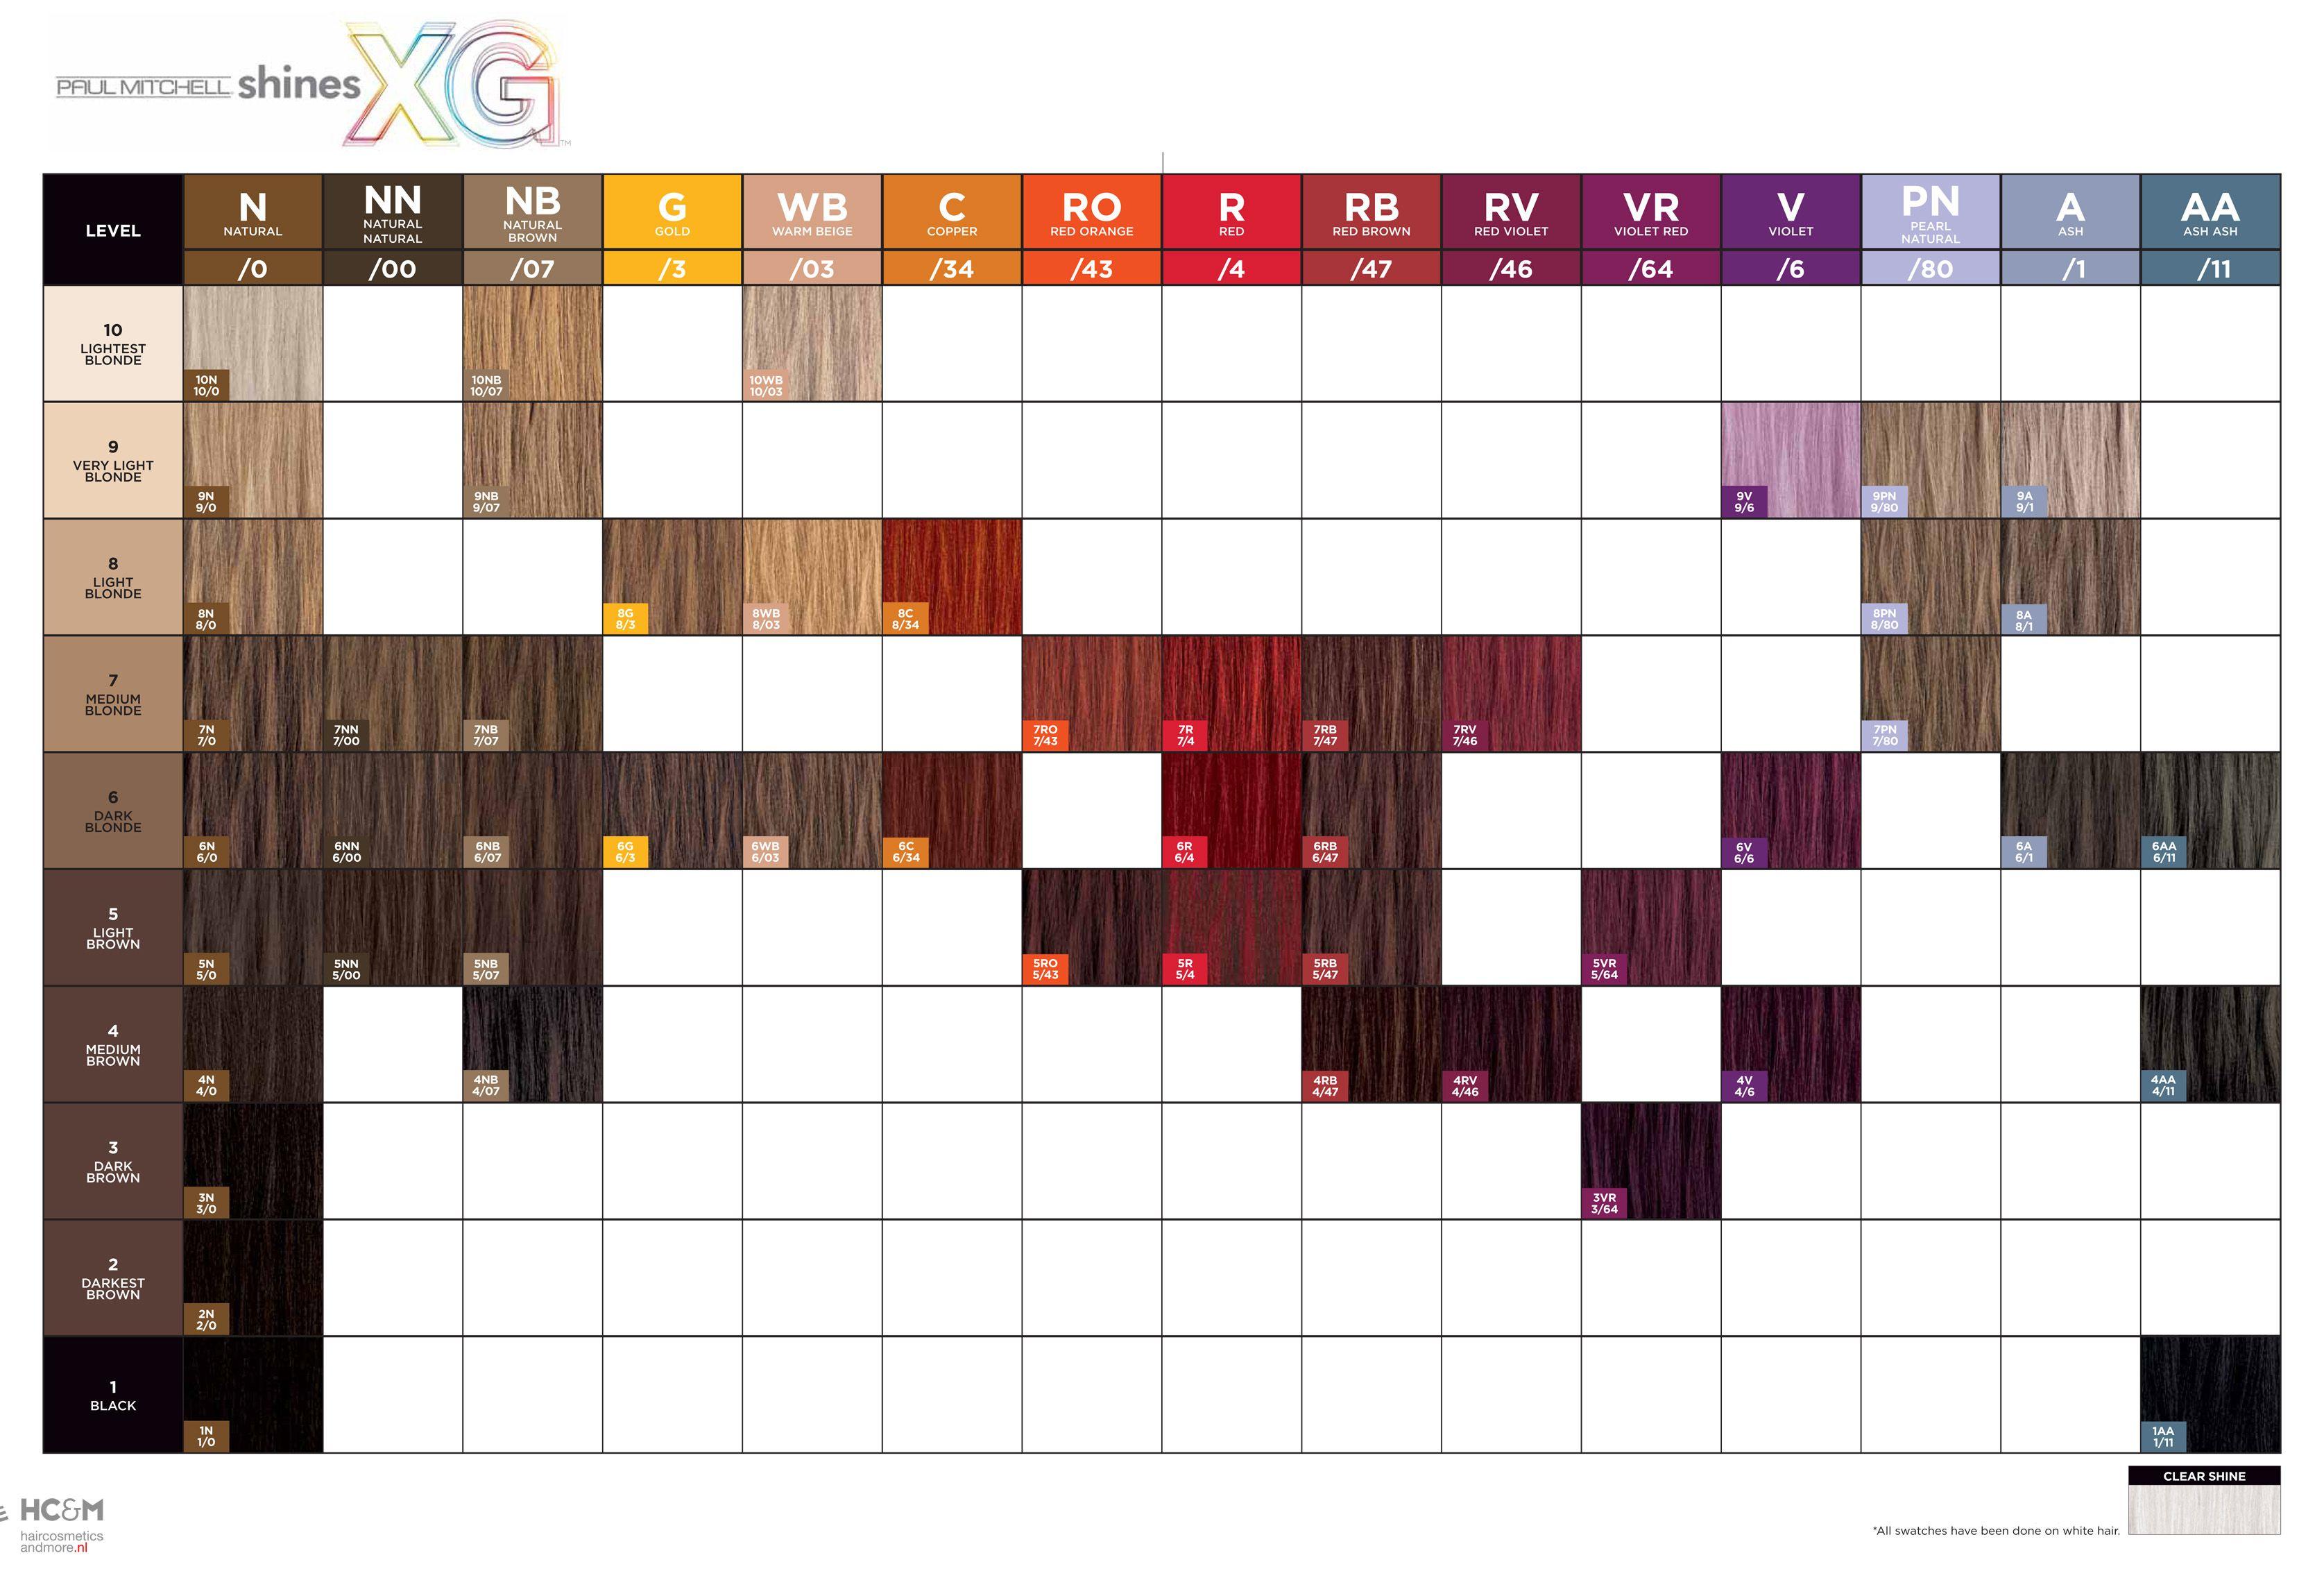 Paul Mitchell Shines Xg Swatch Chart 2014 Hair Color Chart Paul Mitchell Color Paul Mitchell Color Chart